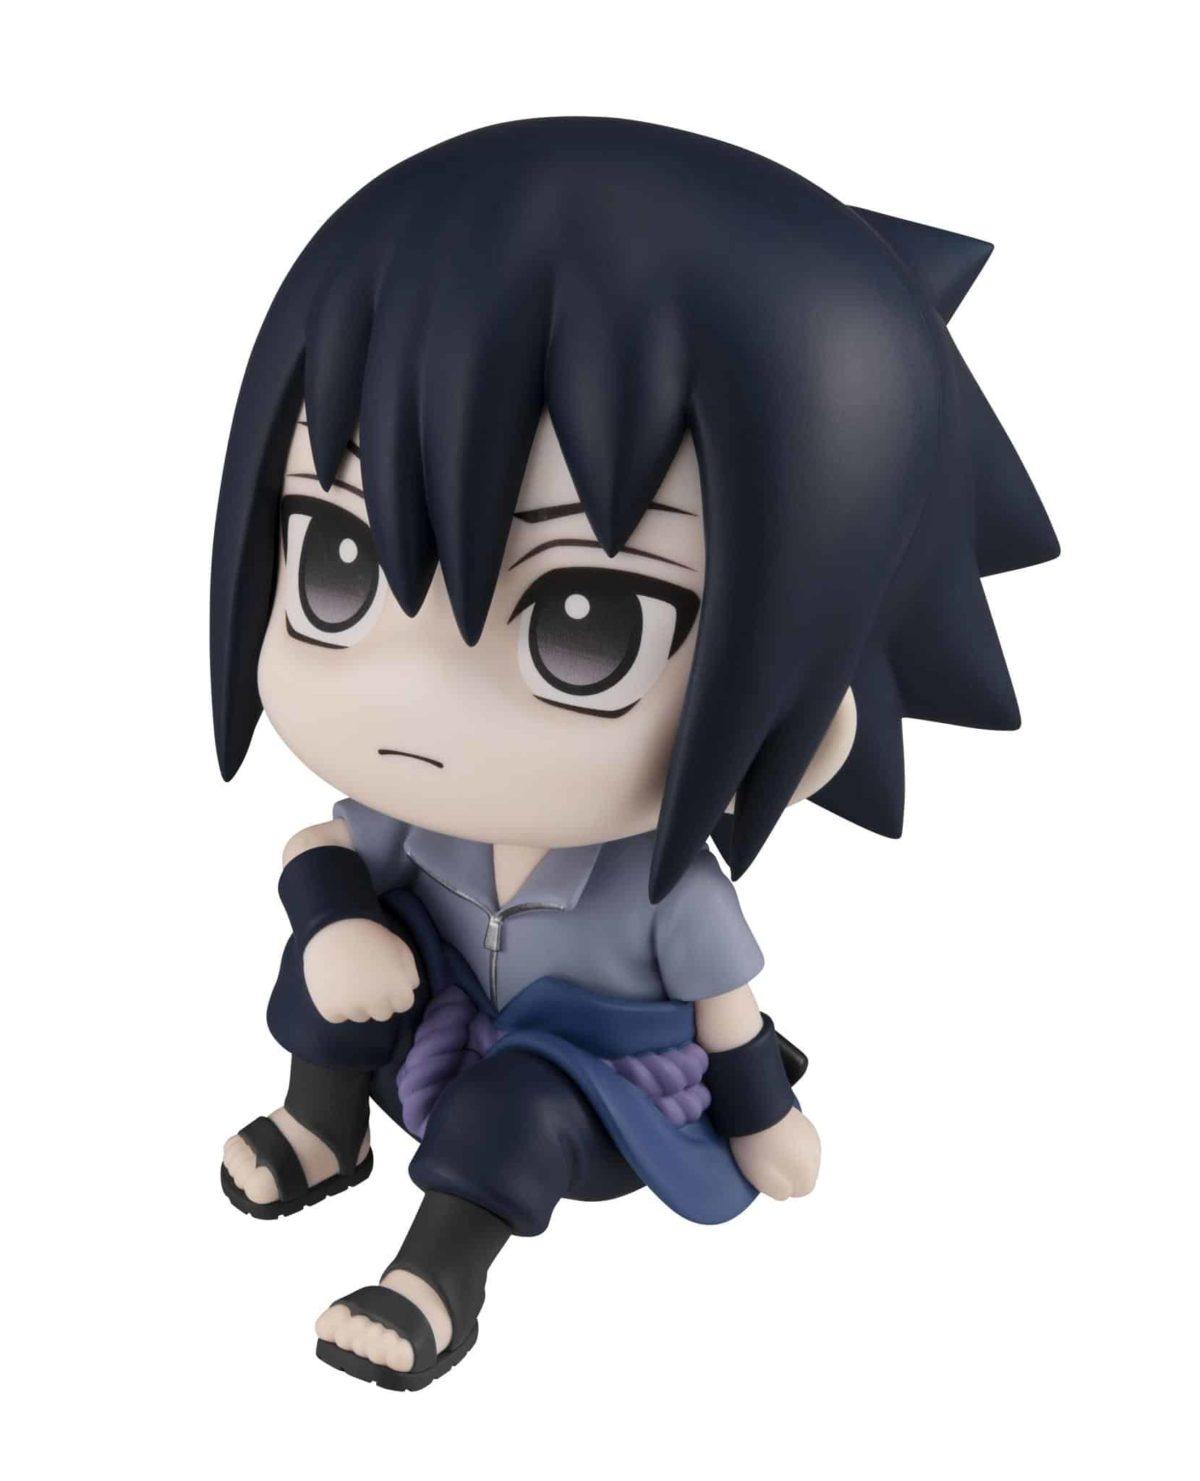 Naruto Shippuden Uchiha Sasuke Lookup Series Figures 2